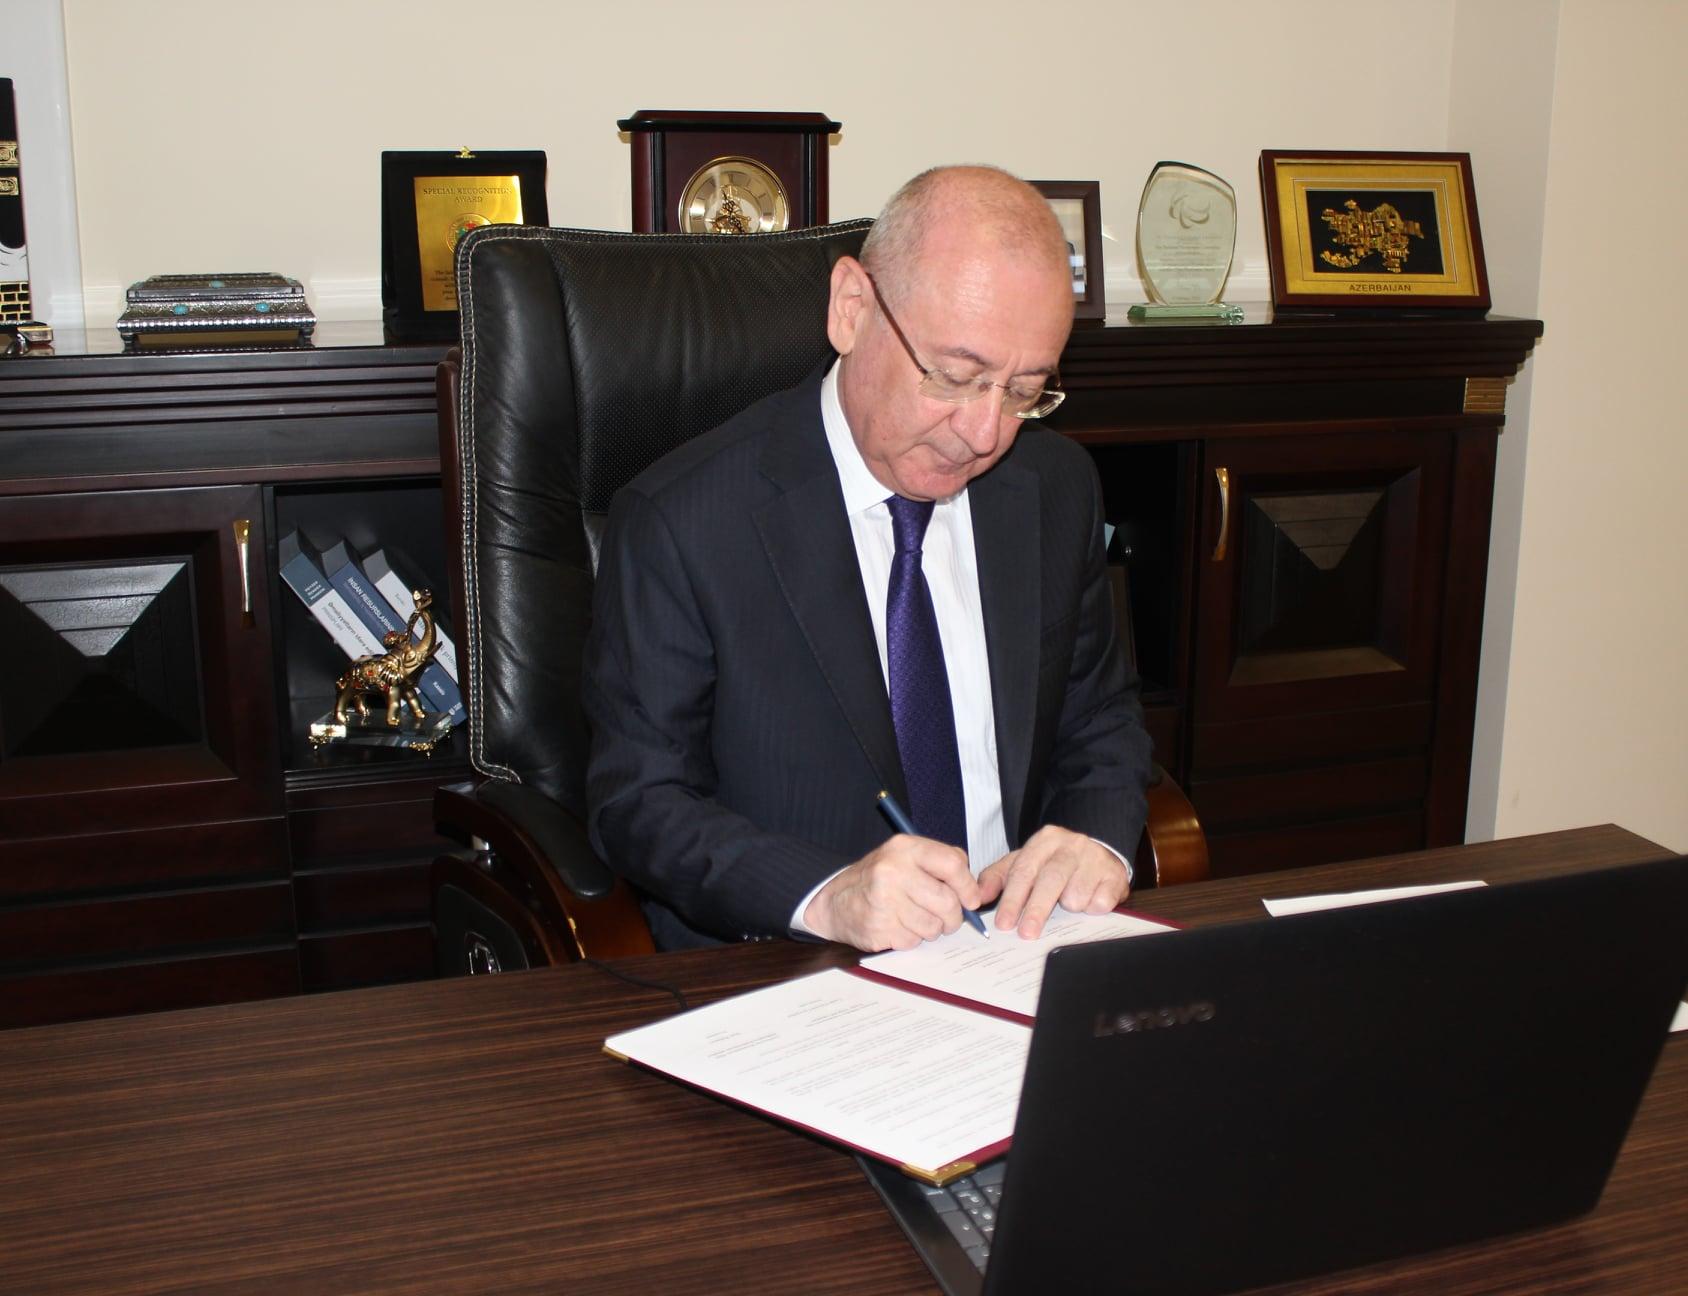 Videokonfrans formatında anlaşma memorandumu imzalanıb